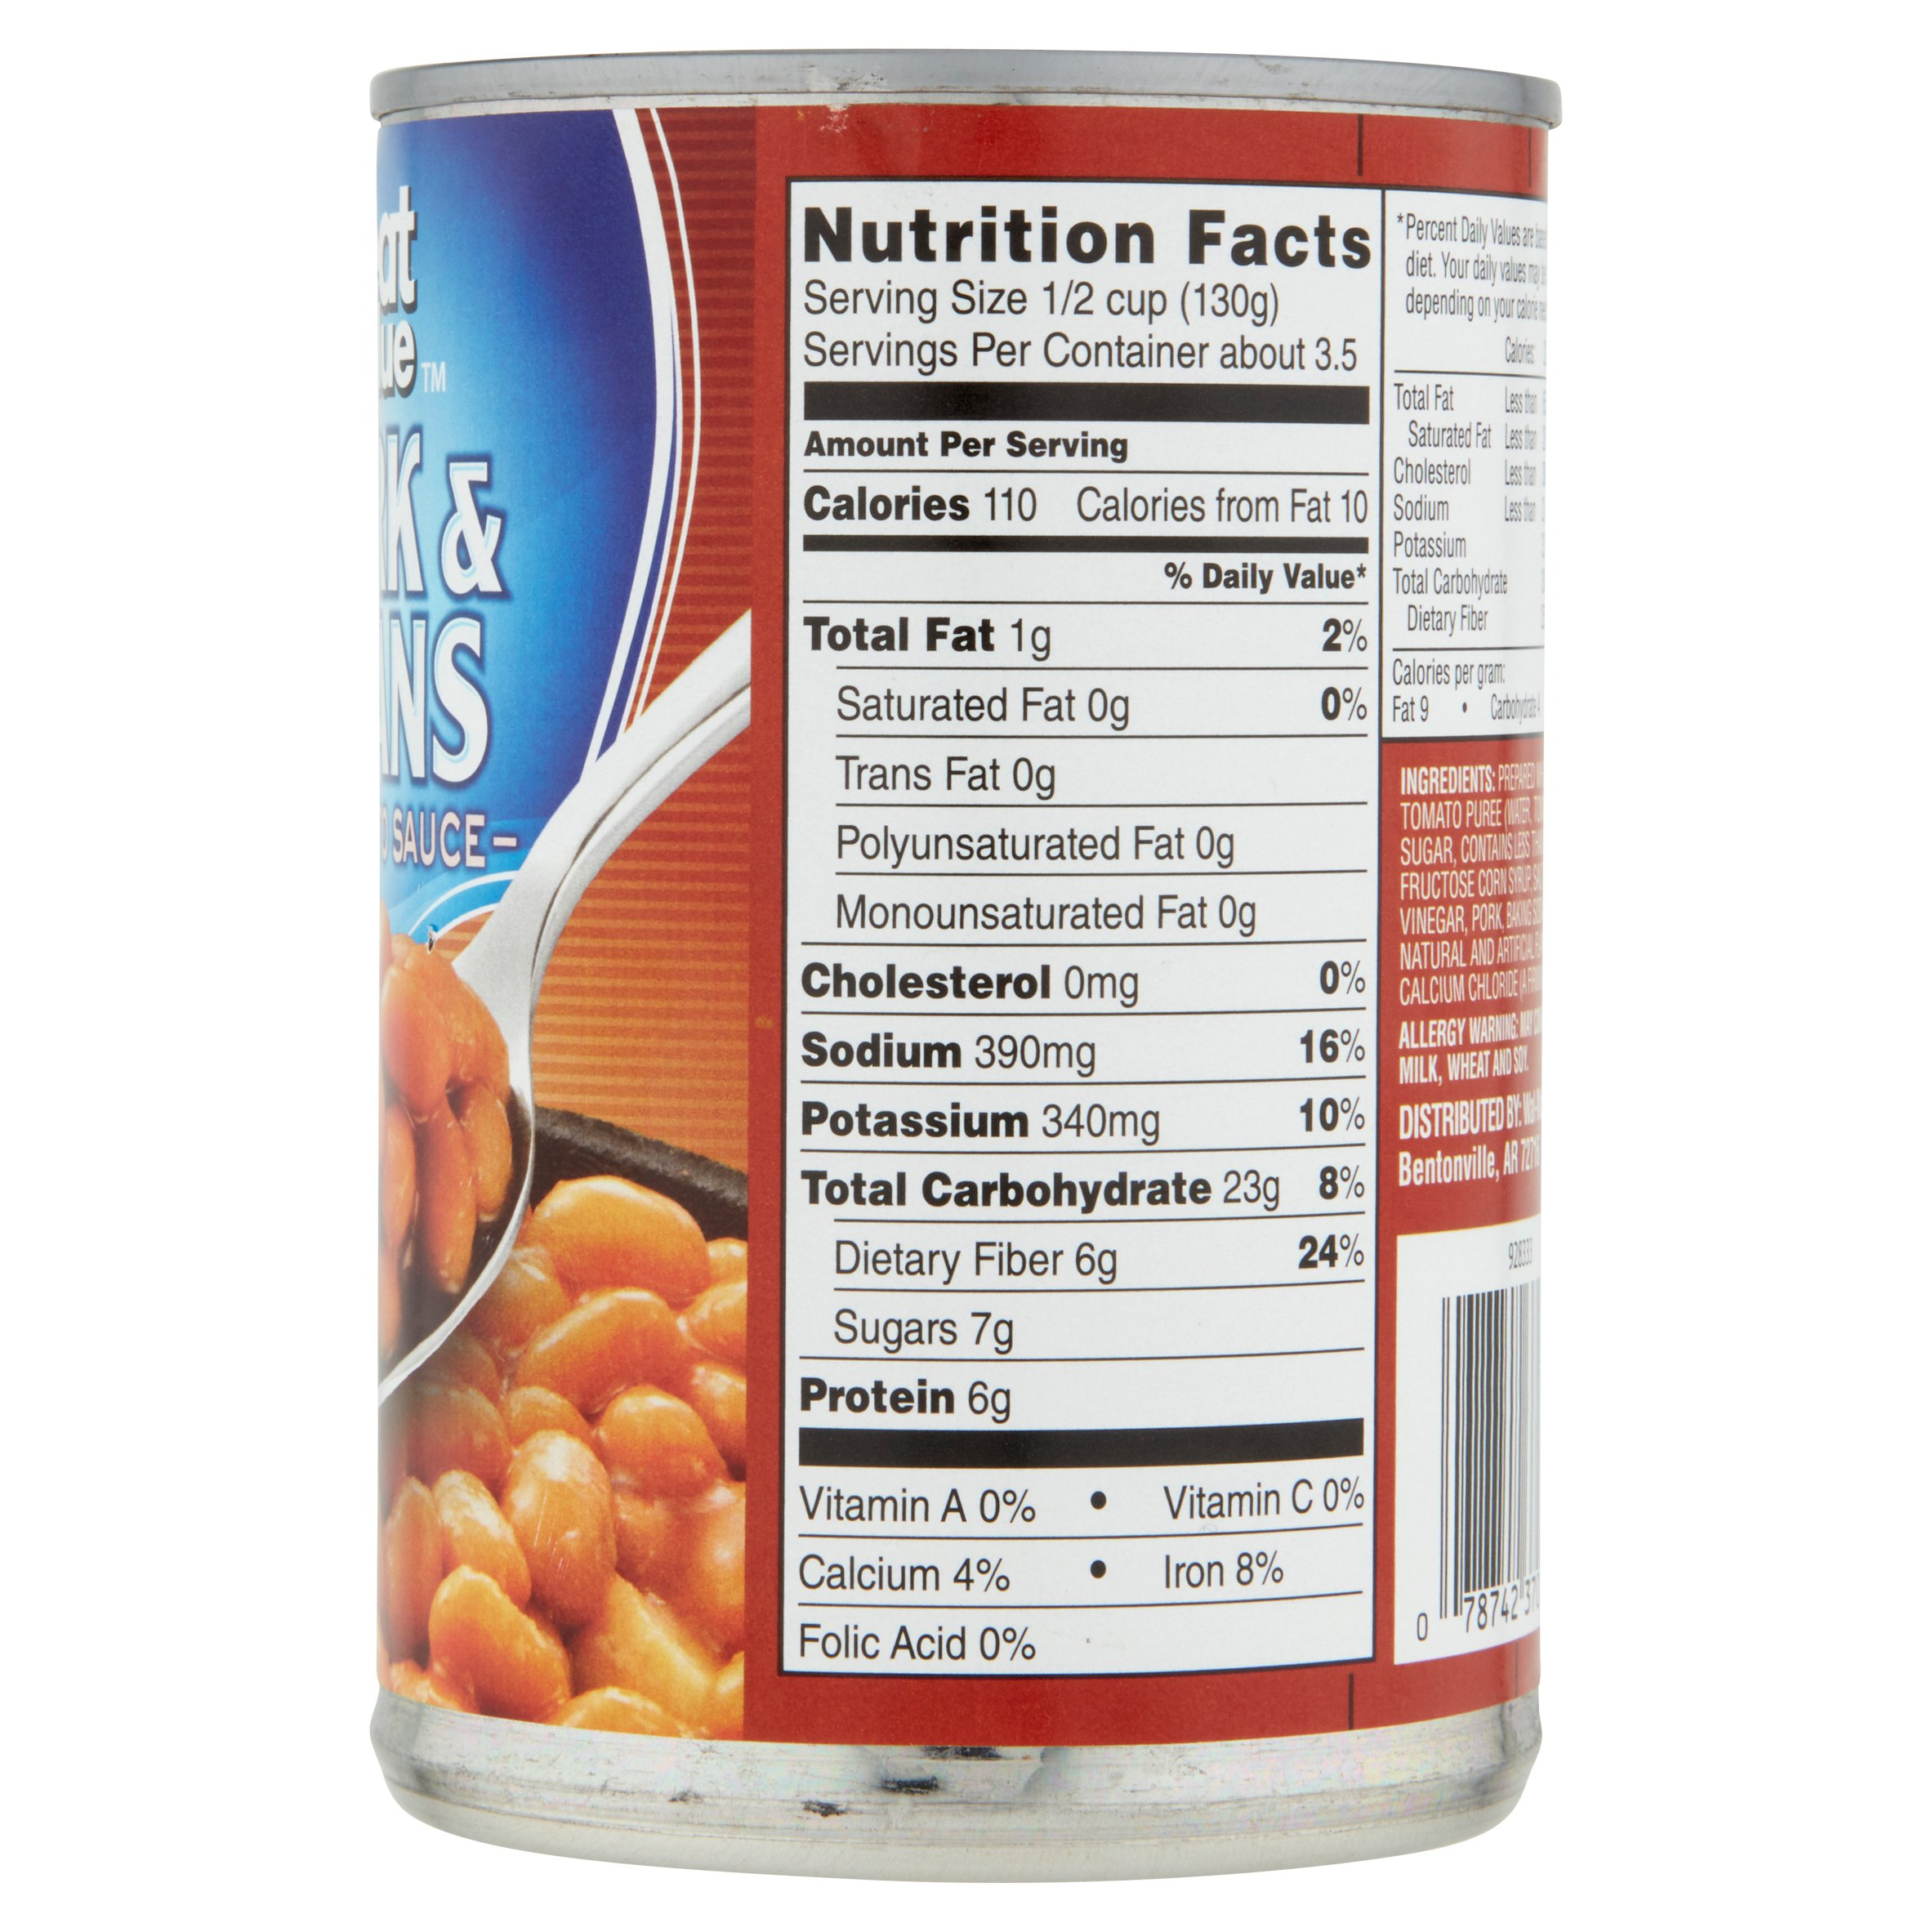 Black Beans Nutrition Facts advise